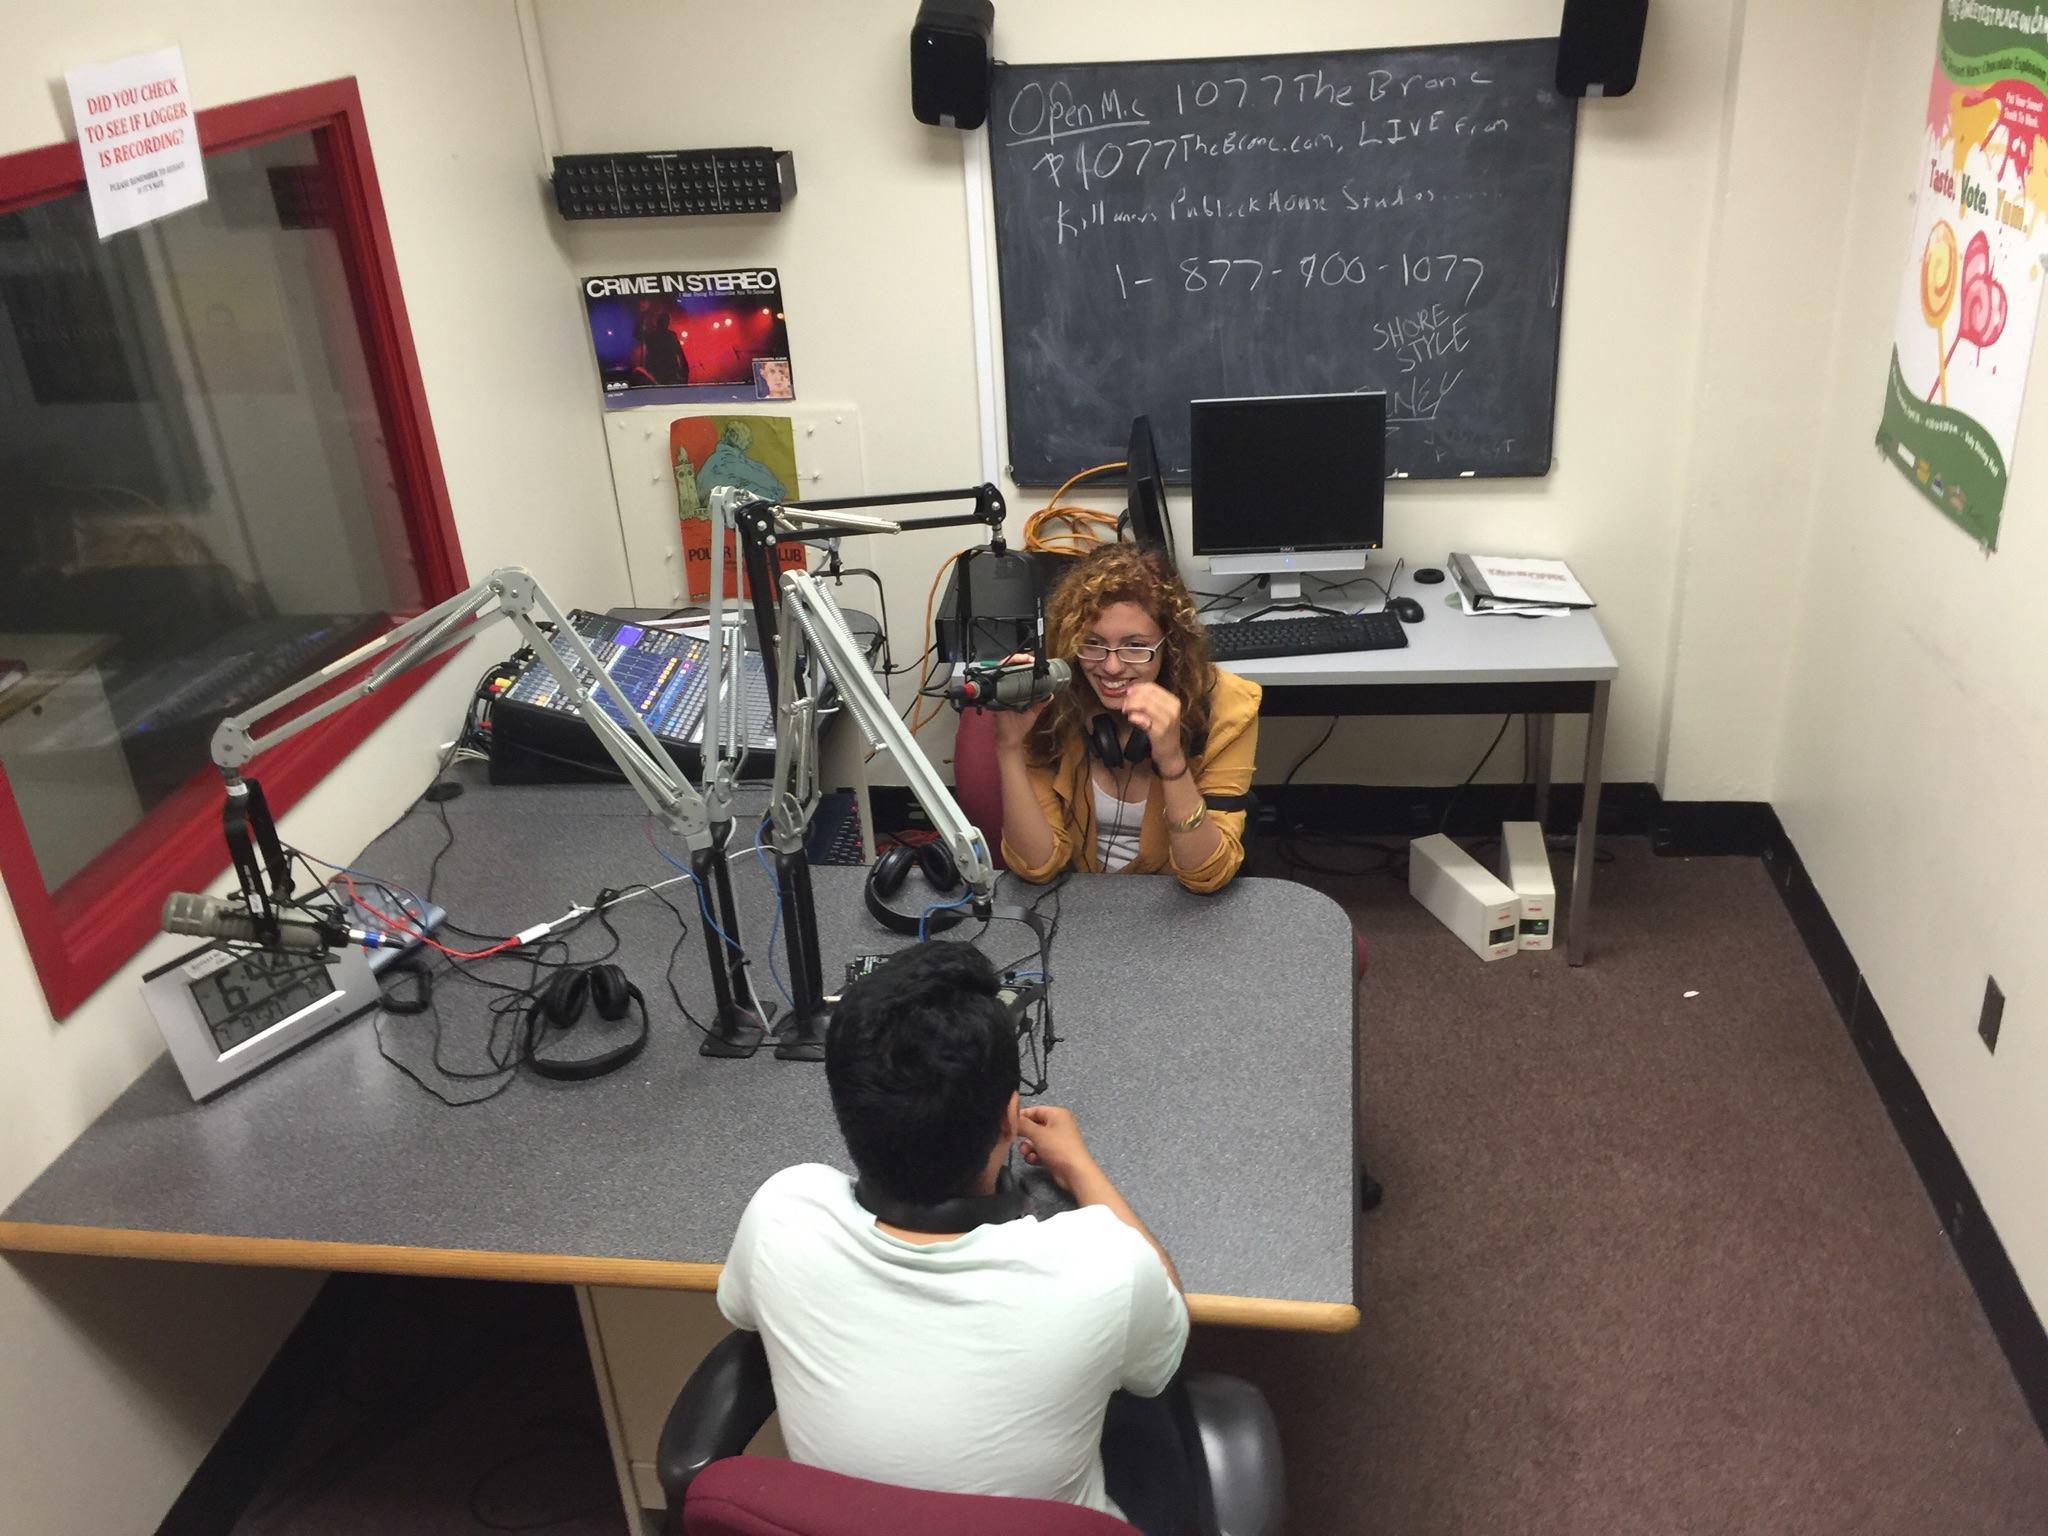 July 10, 2016 – Angel & Kim at work